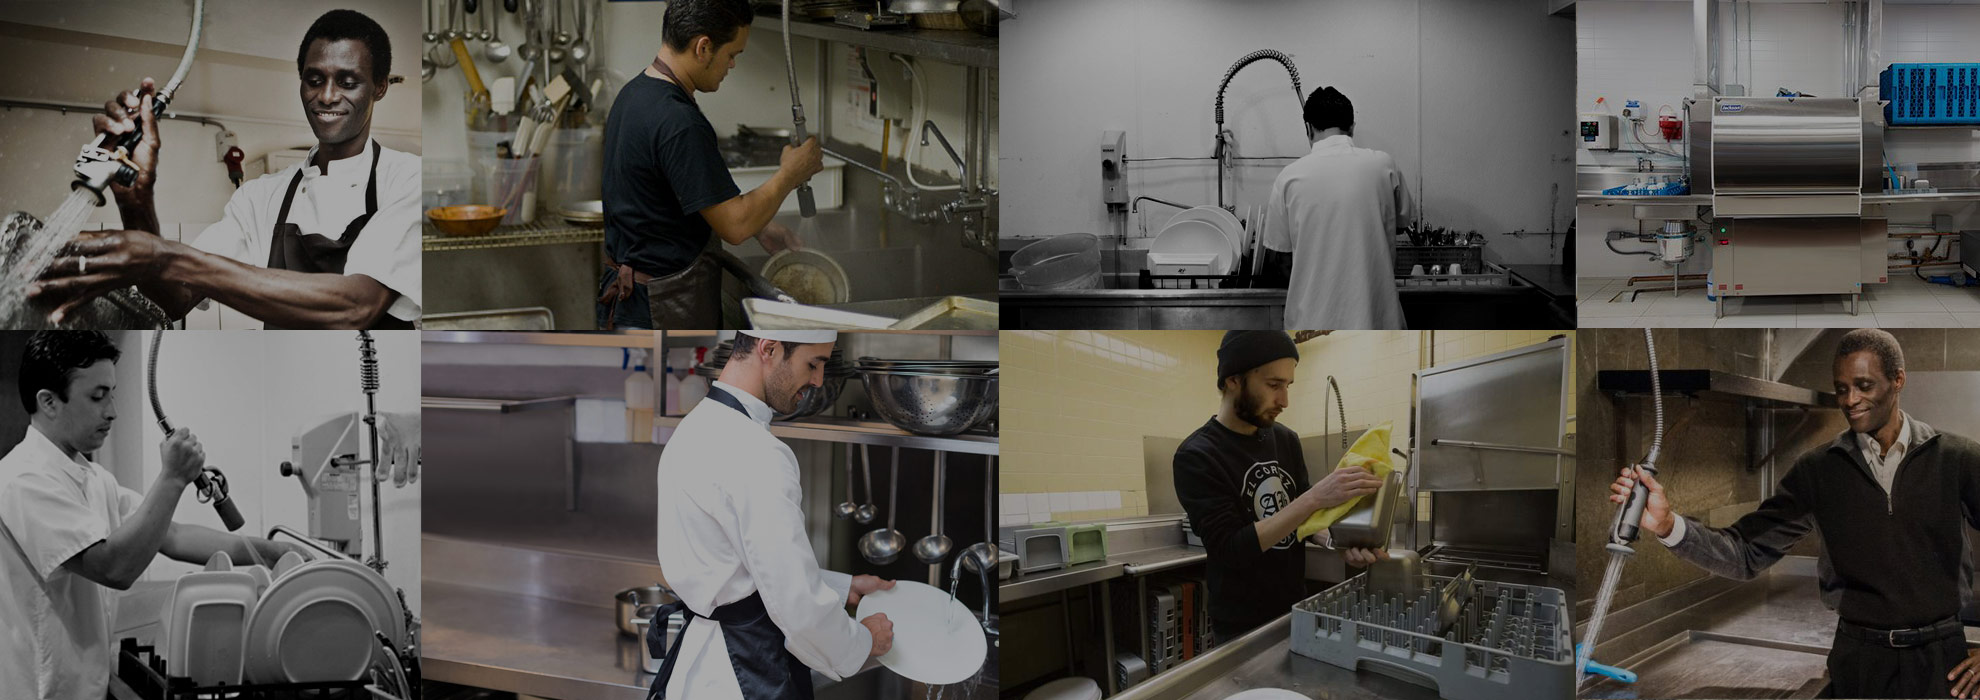 Dishwasher Restaurant Job Description